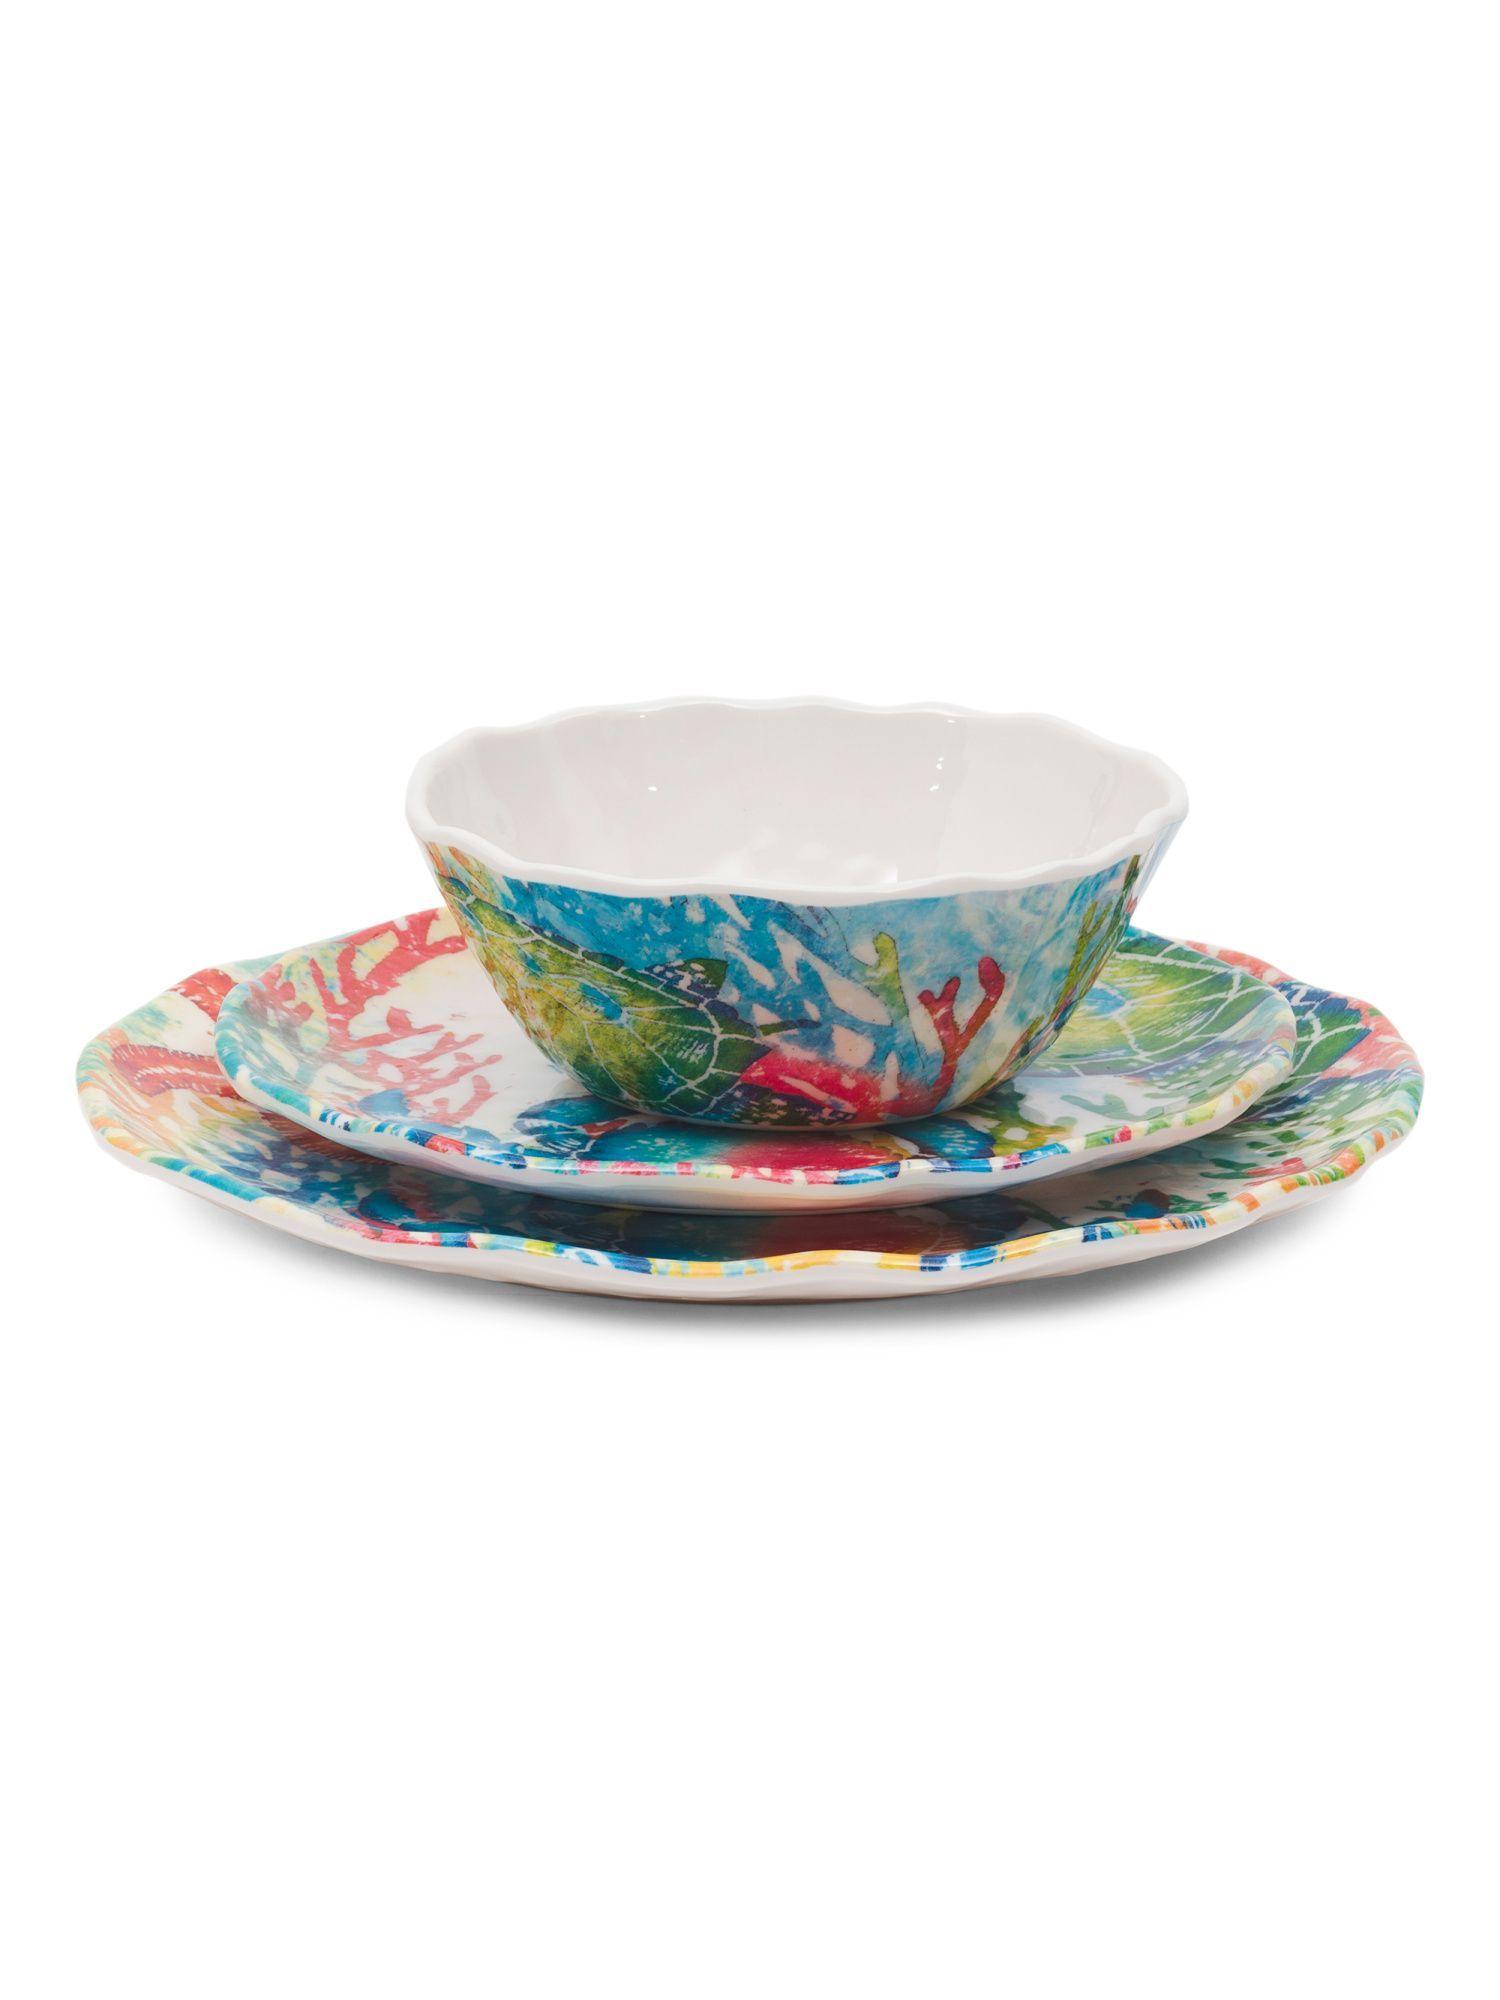 12pc Marine Life Outdoor Dinnerware Set | Products | Pinterest ...